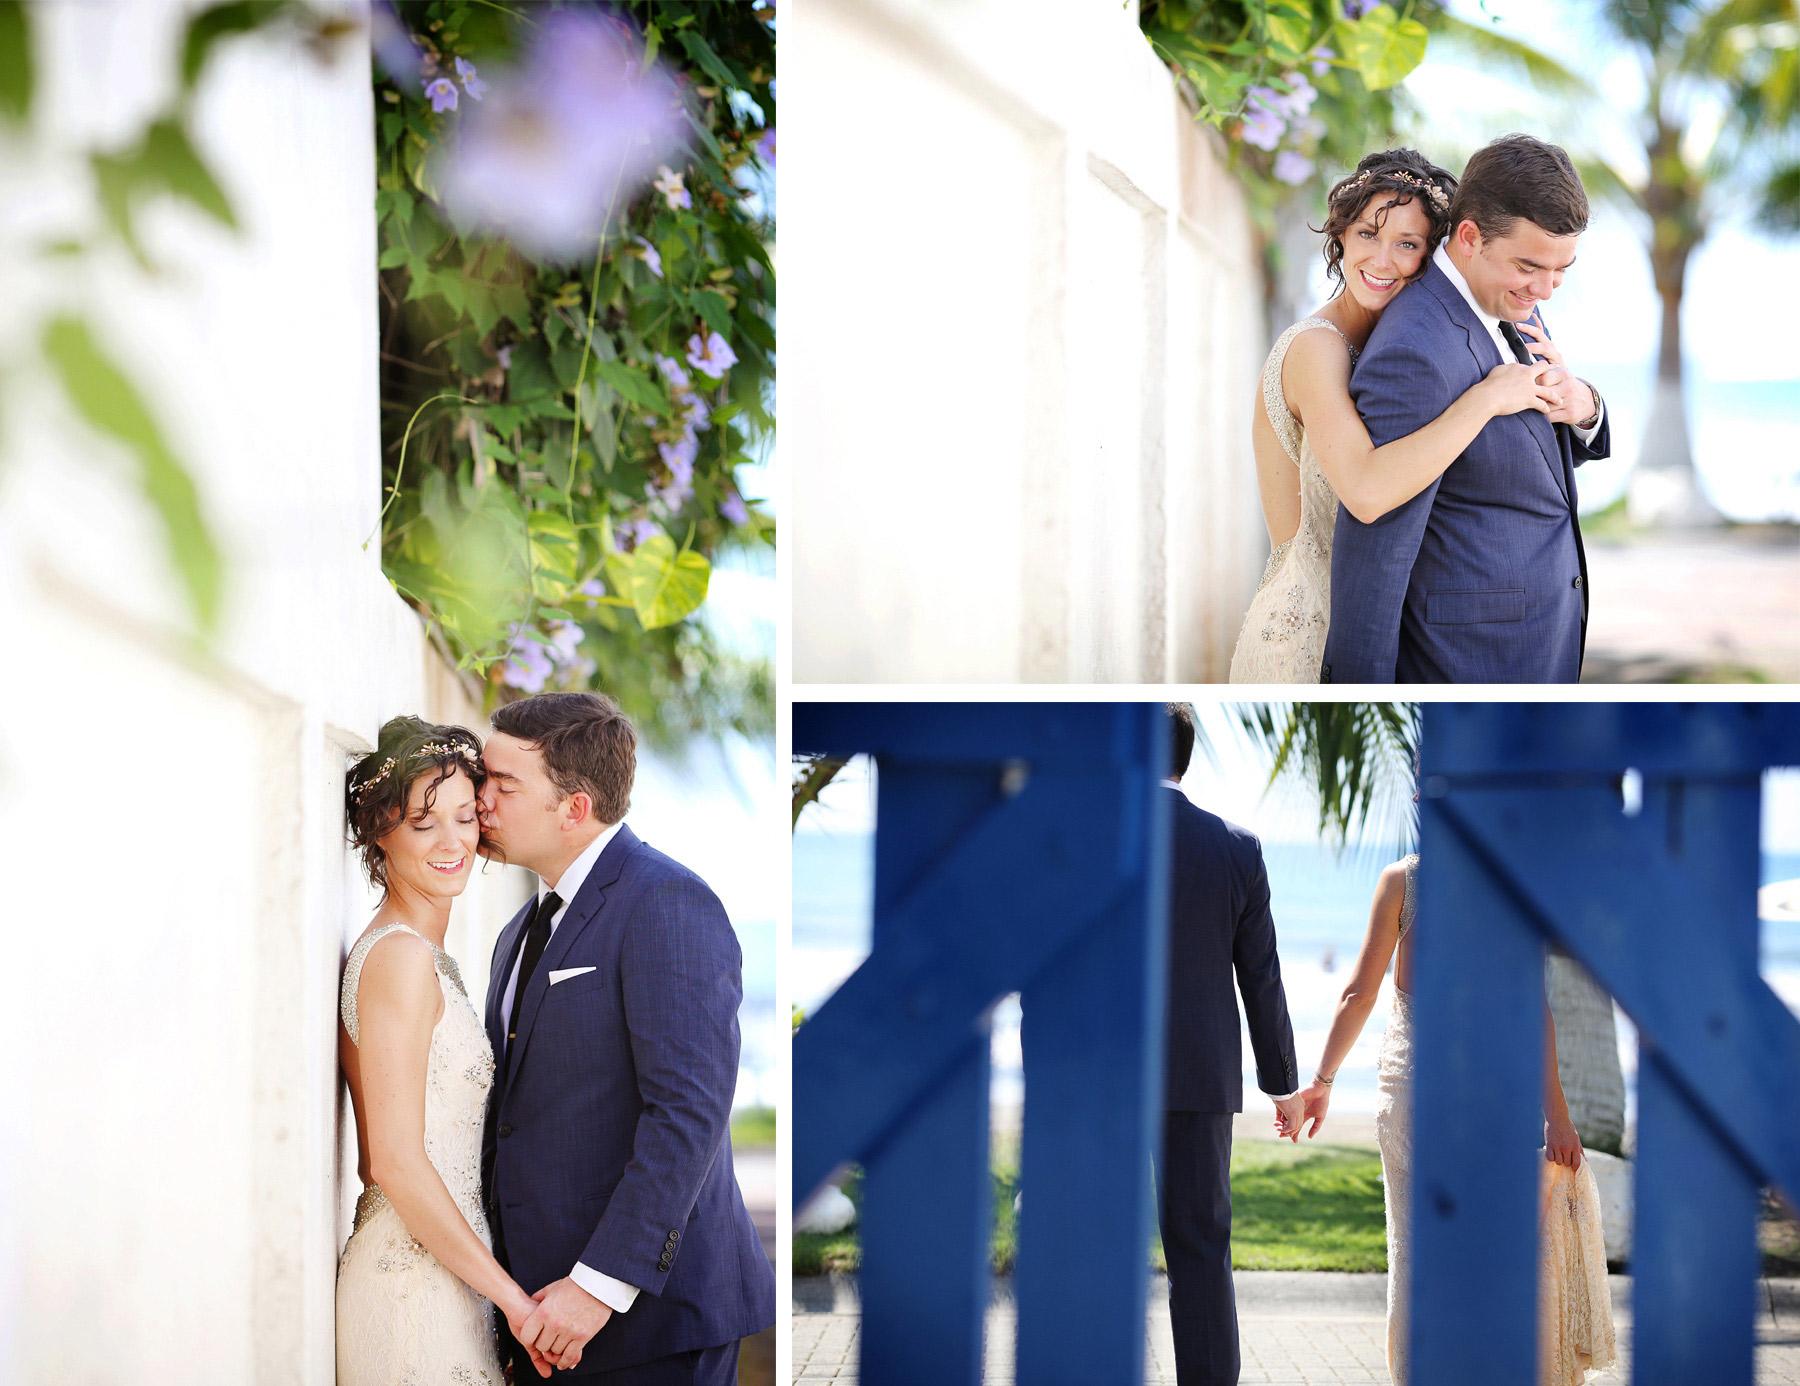 08-Costa-Rica-Wedding-Photography-by-Vick-Photography-Jaco-Tropical-Beach-Villa-Caletas-Resort-Alli-and-Duncan.jpg